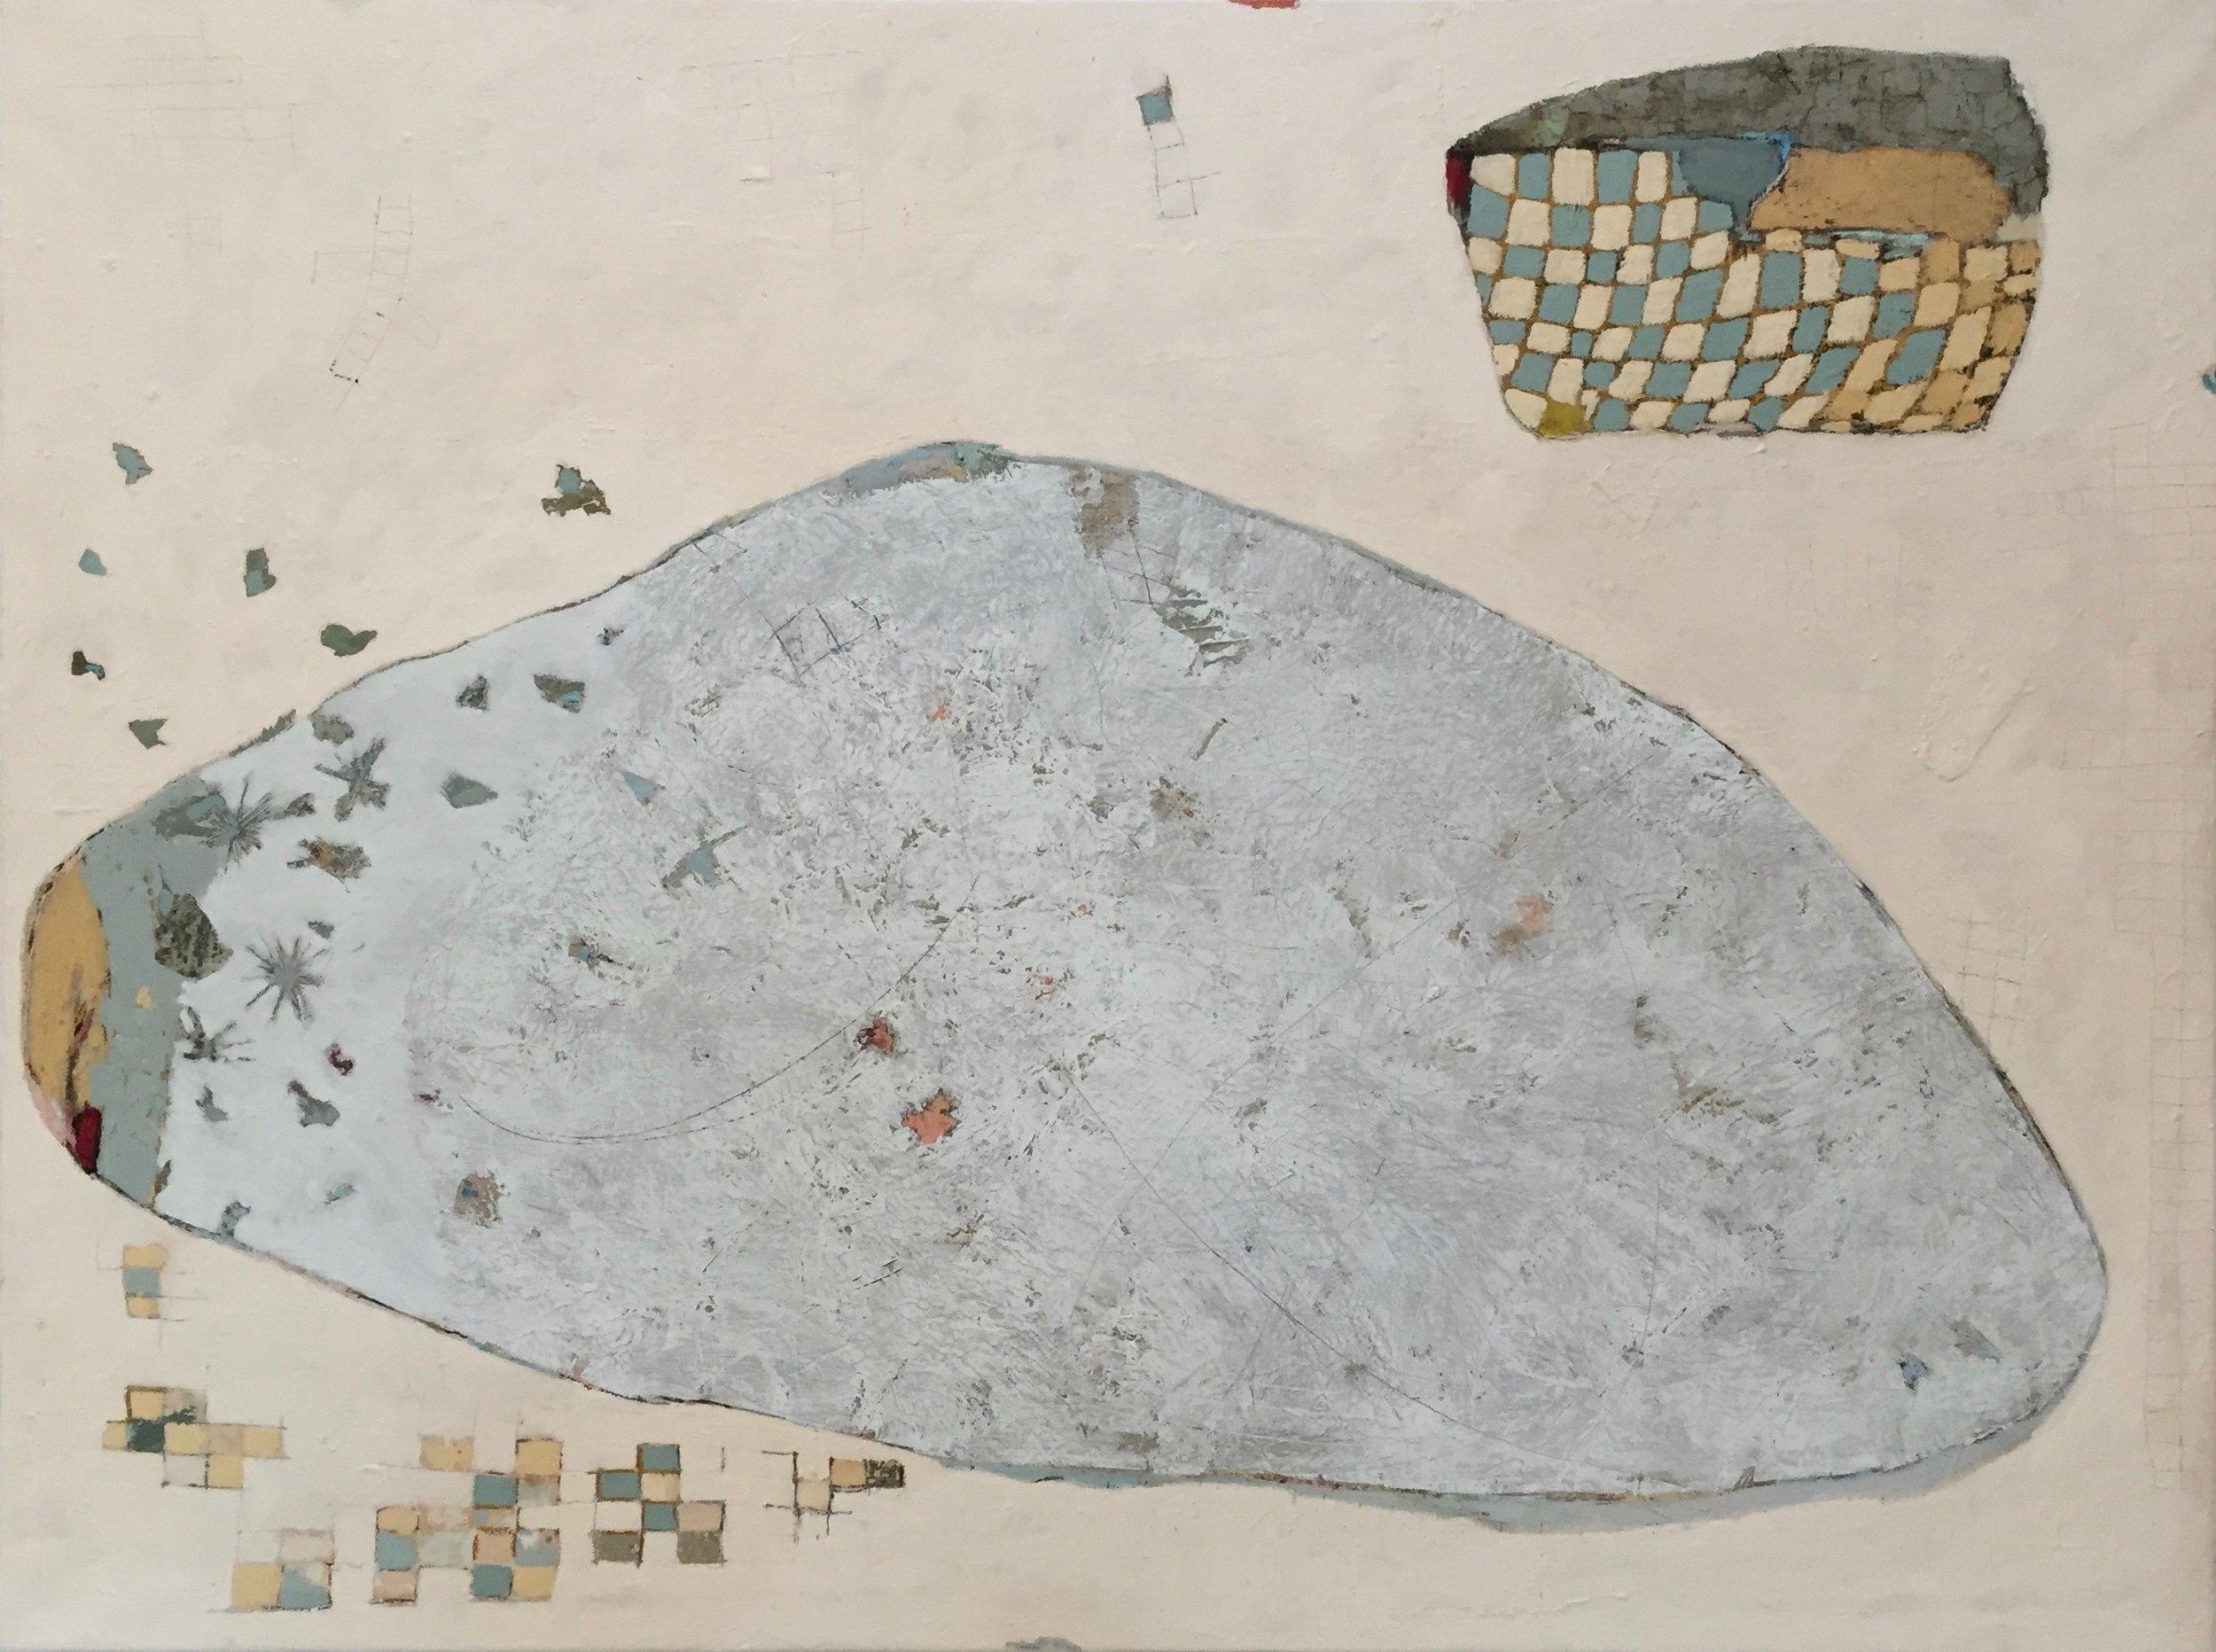 Untitled 184.  Oil on Canvas  210 x 150 x2,5 cm  82,5 x 60 x 1 inch